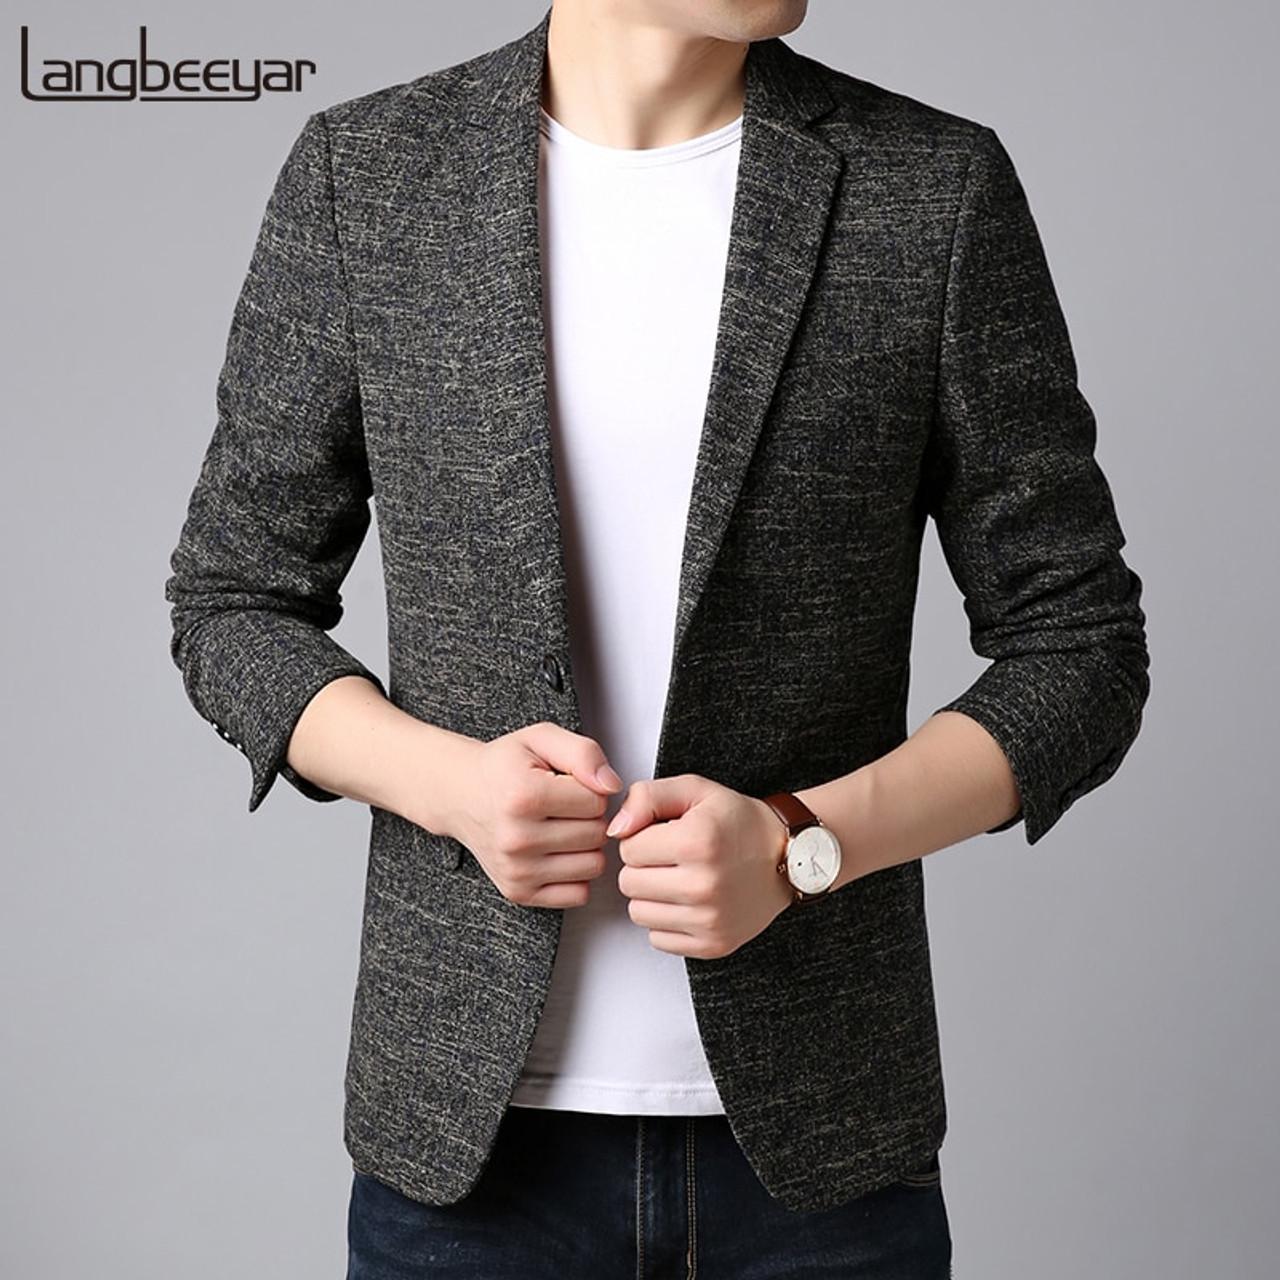 2018 New Fashion Brand Blazer Jacket Men Korean Slim Fit Suits Coat Pattern Pattern Party Dress Trending Casual Men Clothes Onshopdeals Com